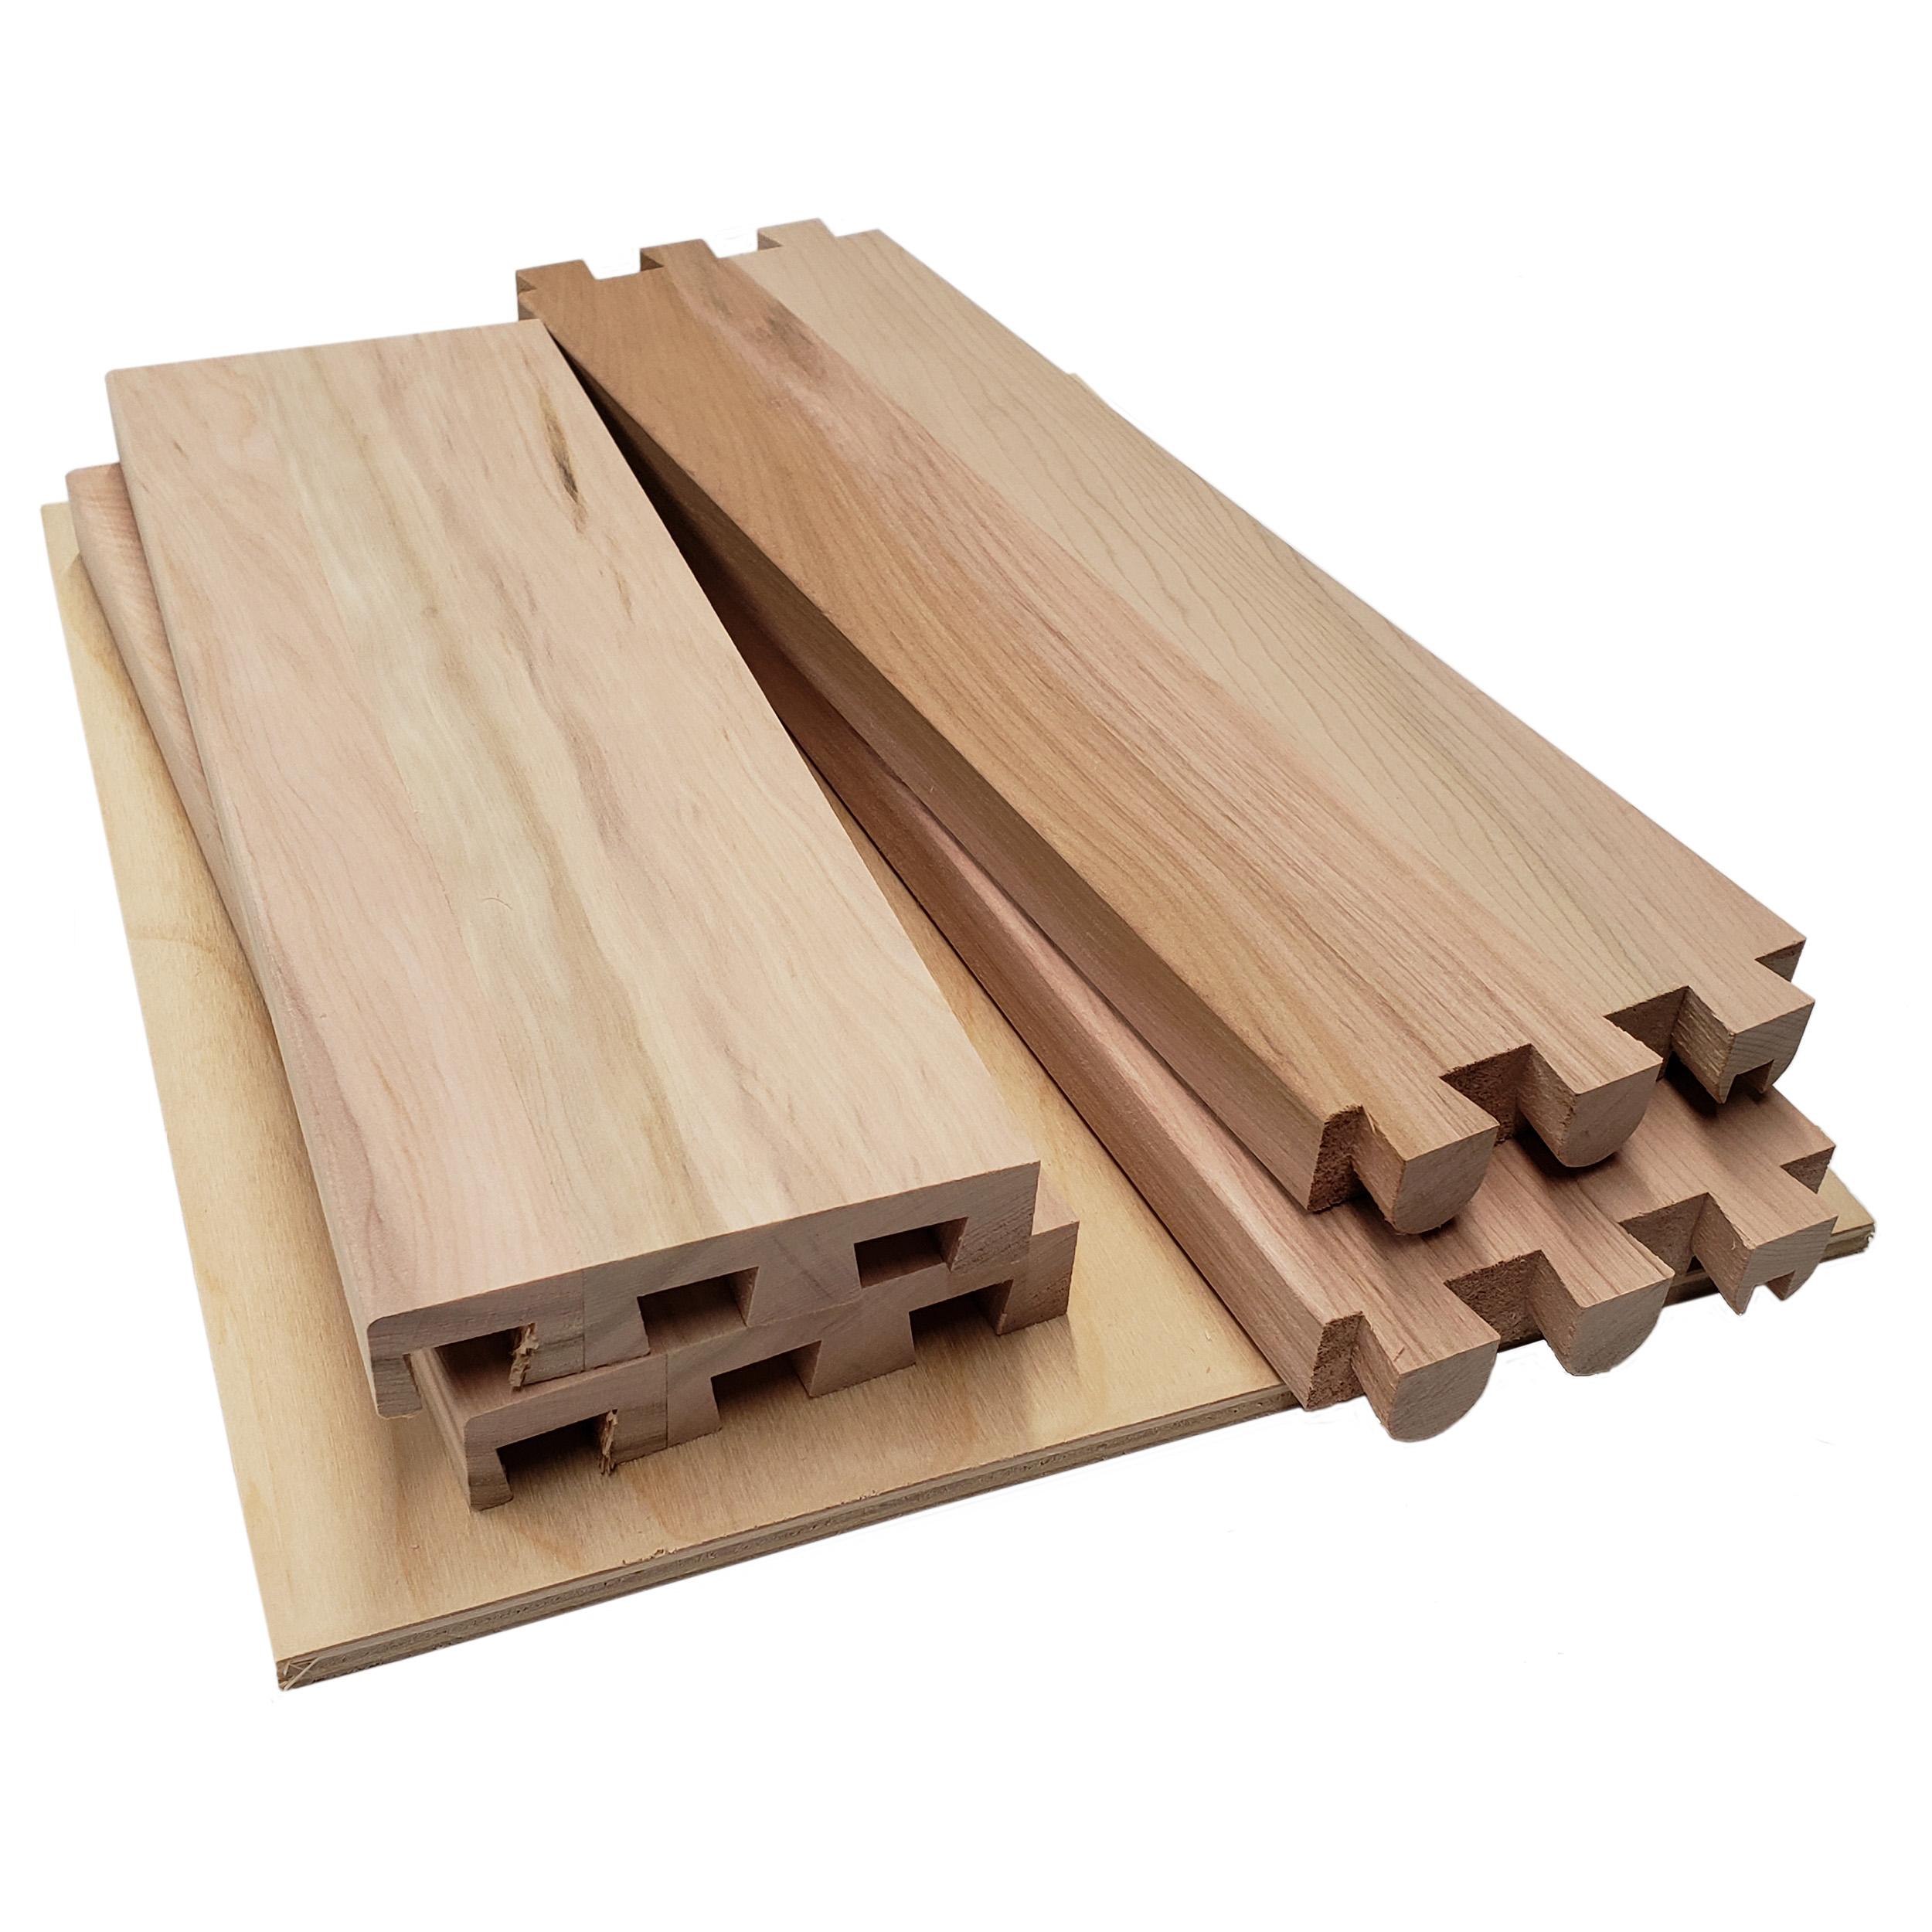 Dovetail Drawer Boxes - 7.125